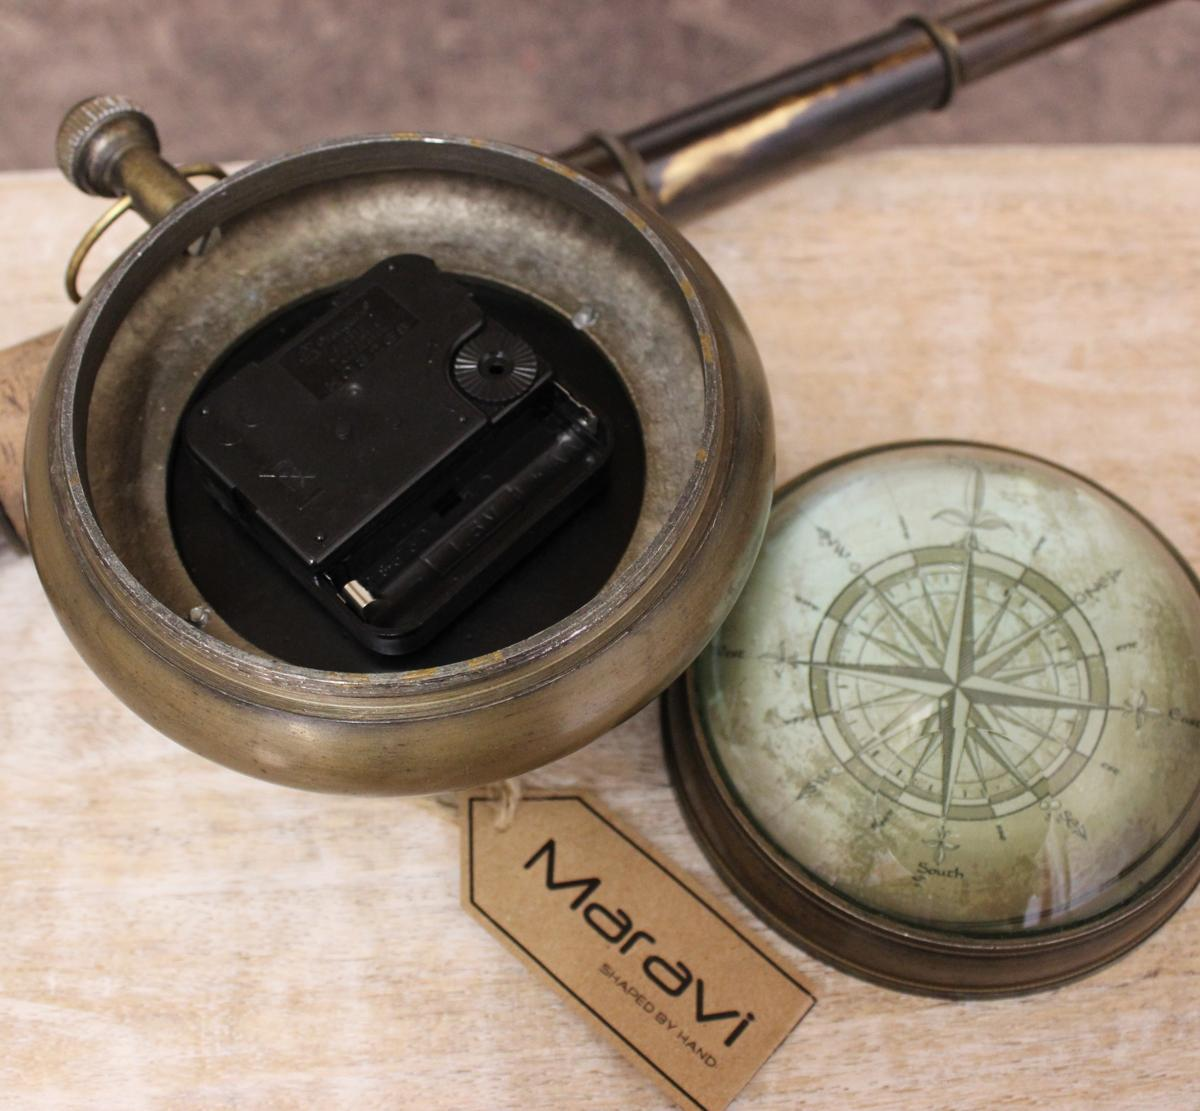 kalanka nautique horloge de bureau boule laiton mantelpiece antique capitaine ebay. Black Bedroom Furniture Sets. Home Design Ideas